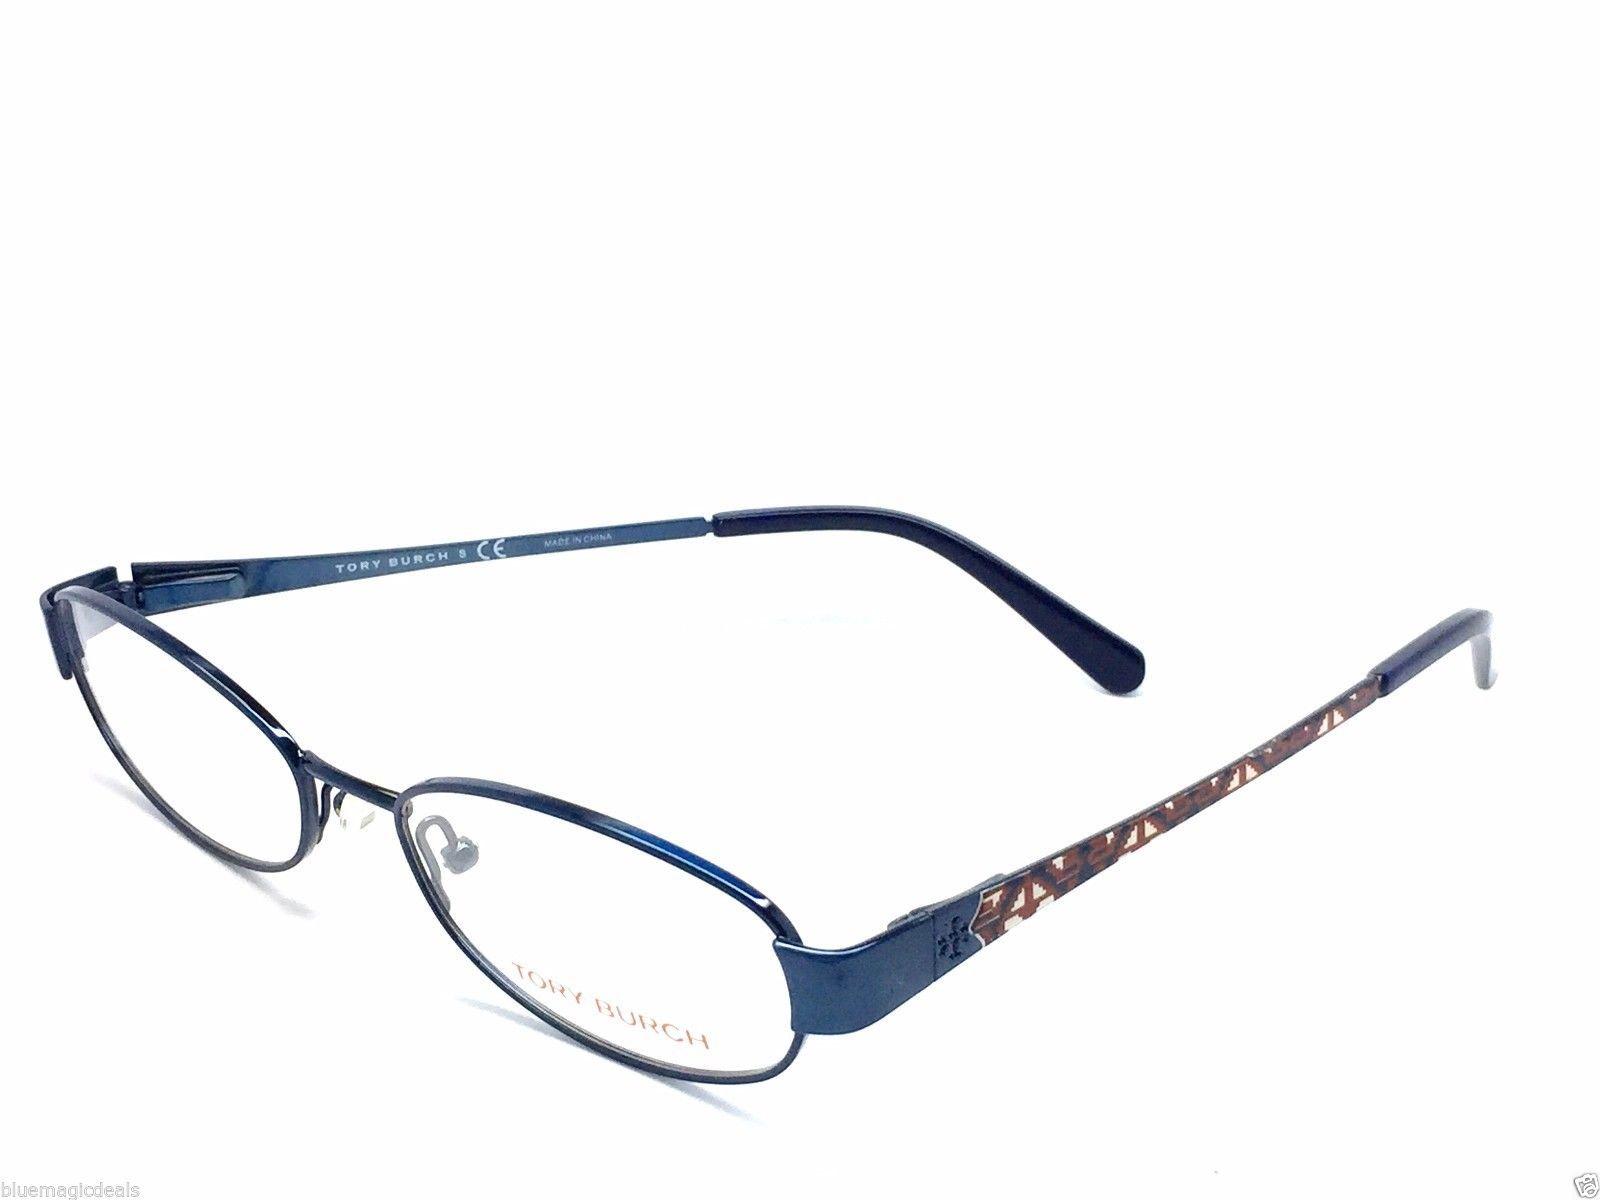 8ff215e483 Tory Burch Brille Ty 1029 414 Marineblau and 50 similar items